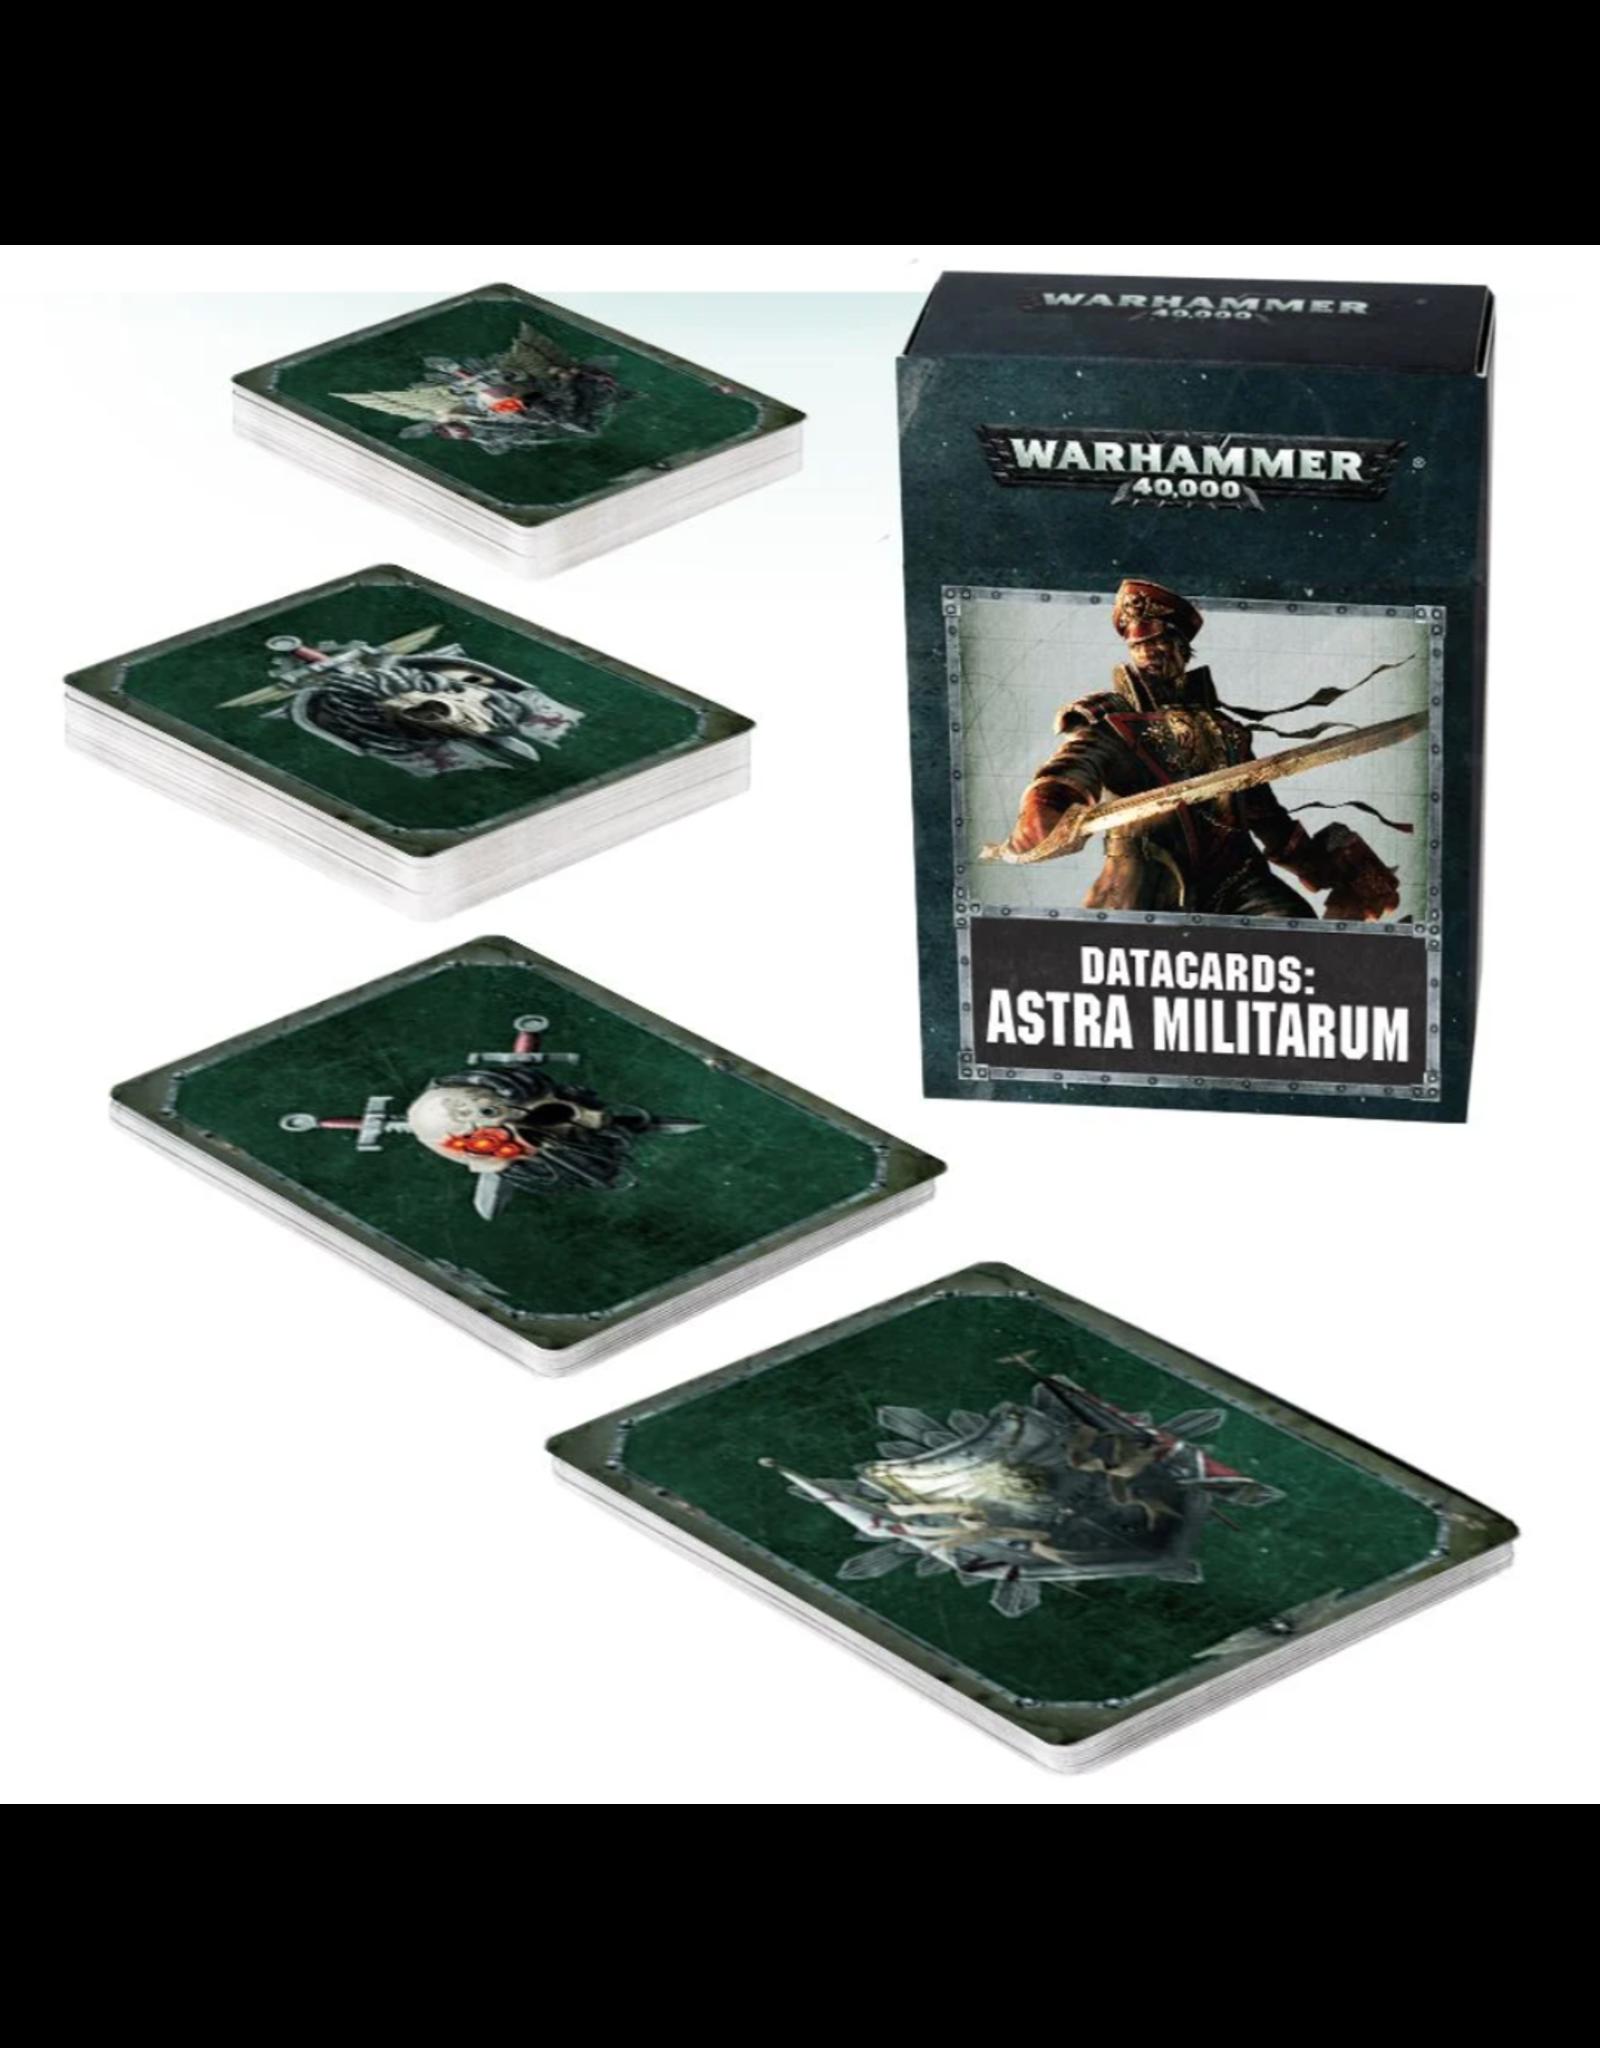 Warhammer 40K Datacards: Astra Militarum